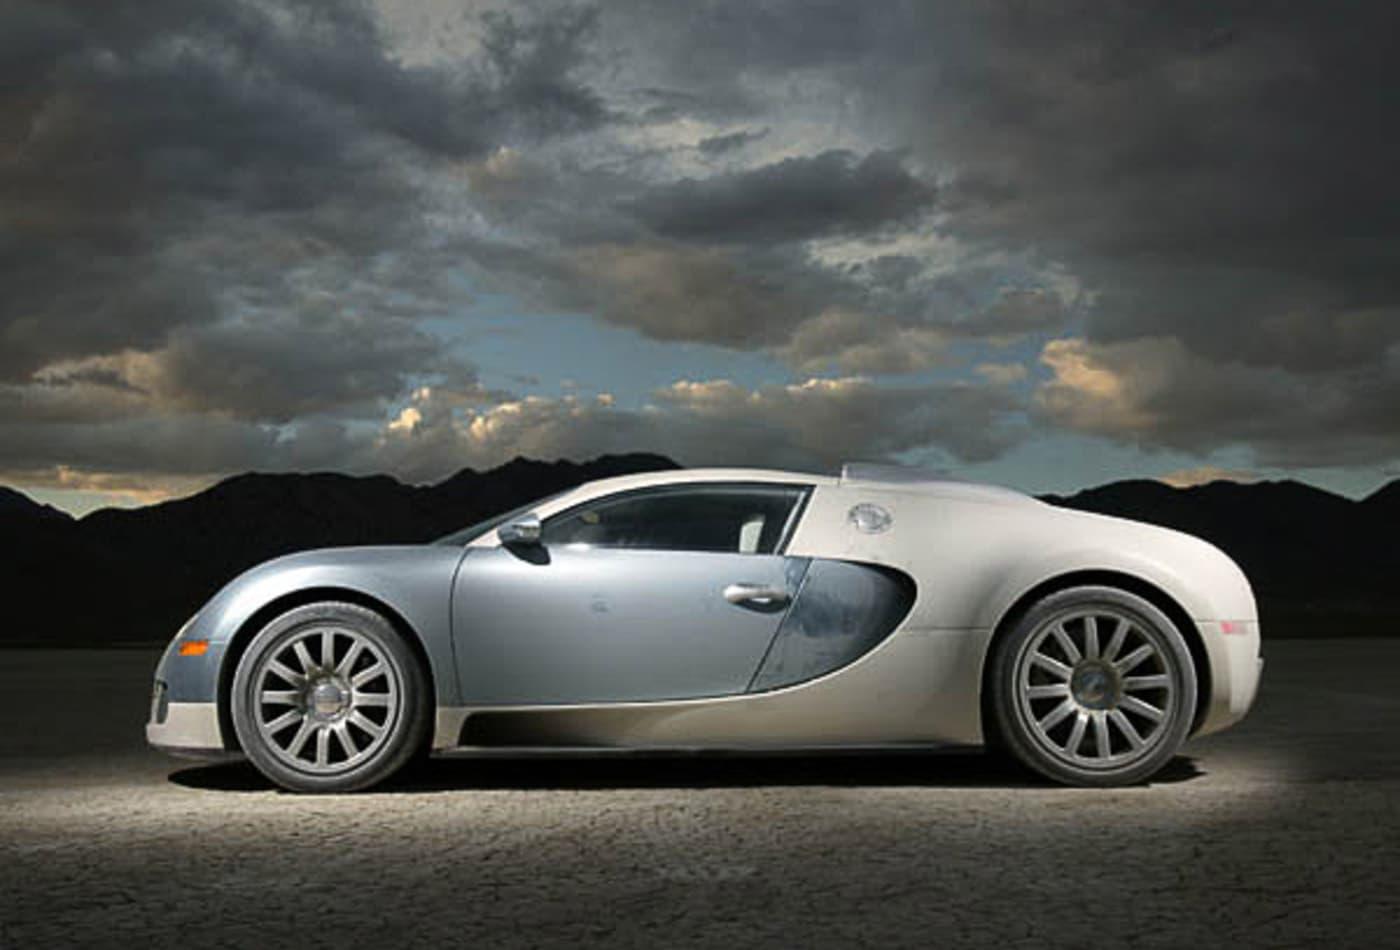 Bugatti-Veyron-Super-Sport-10-Fastest-Cars-2013-CNBC.jpg